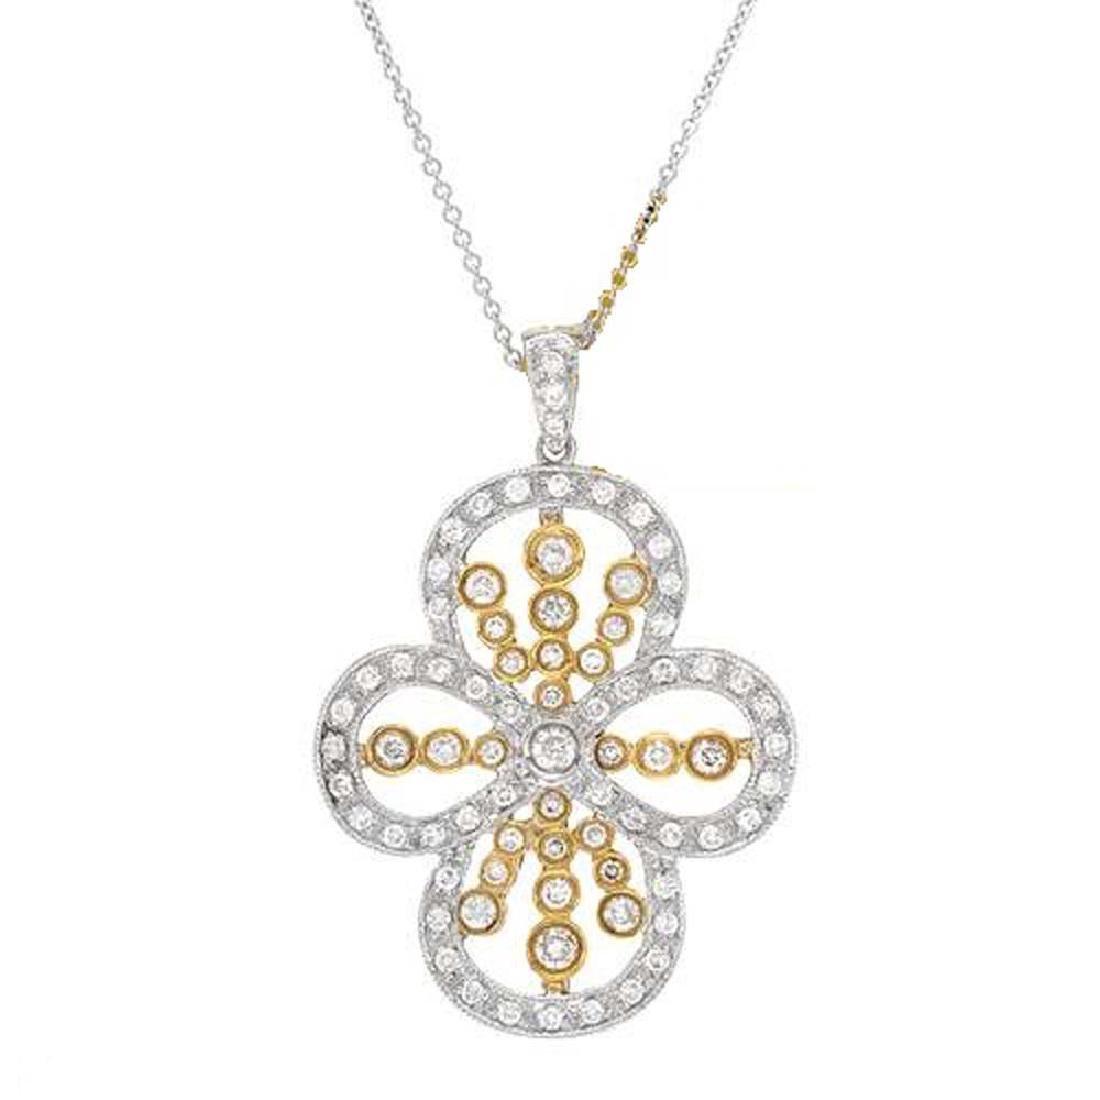 Genuine 1.15TCW 18K Two Tone Gold Ladies Necklace